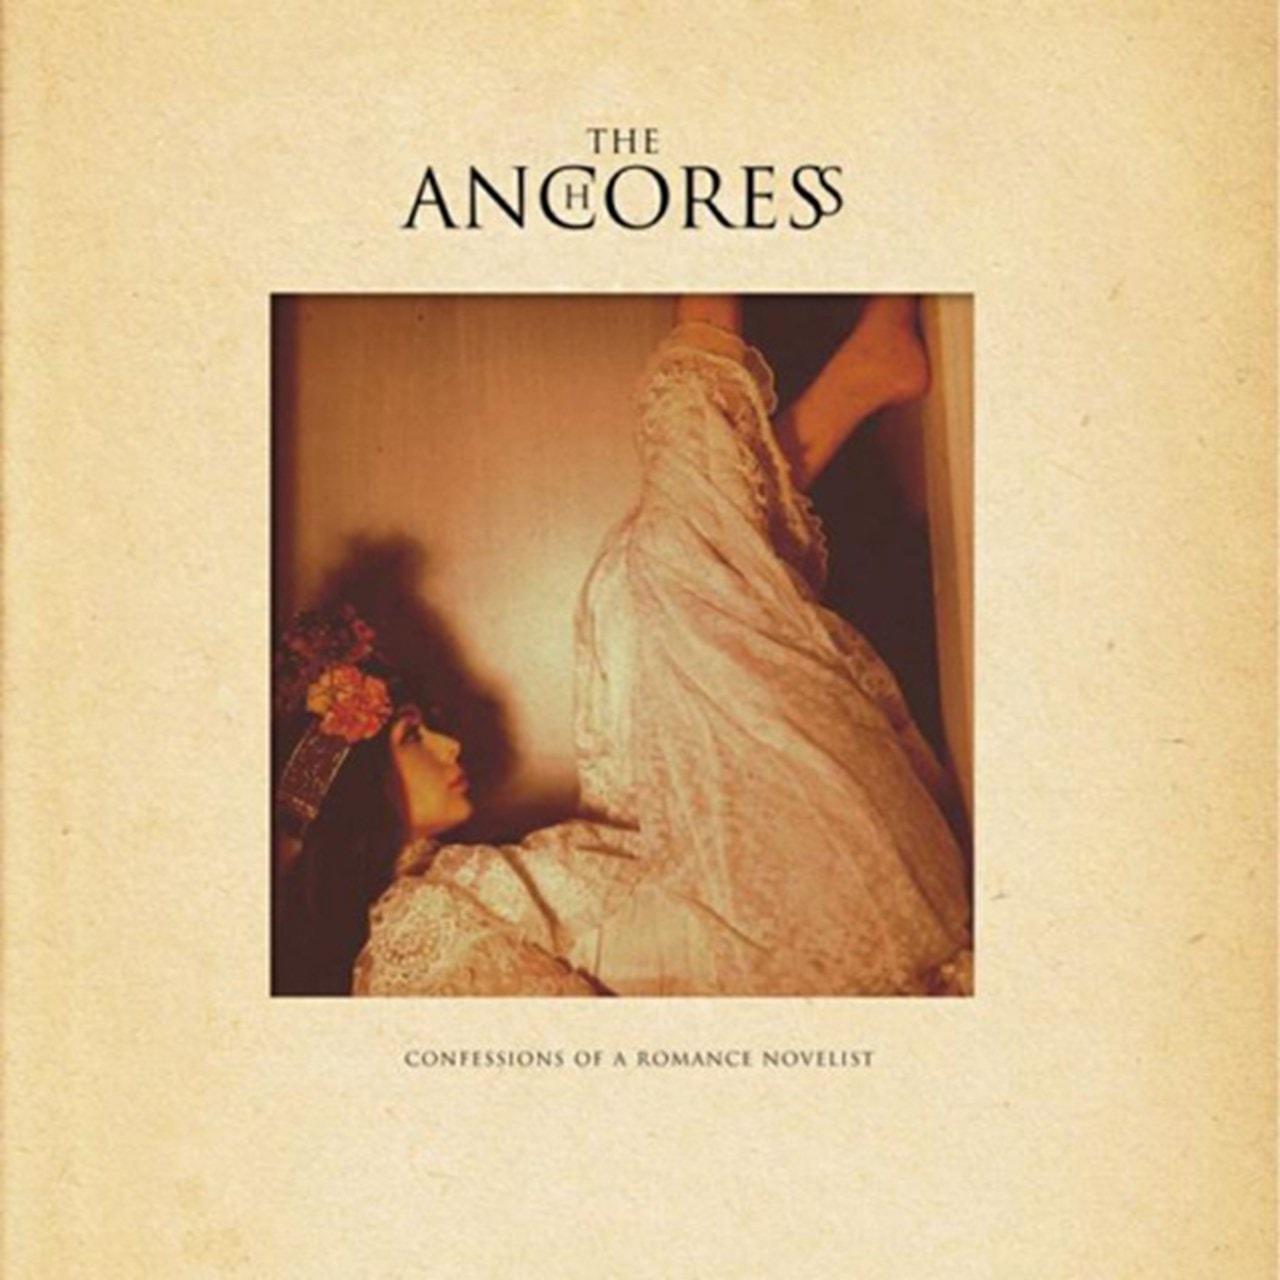 Confessions of a Romance Novelist - 1